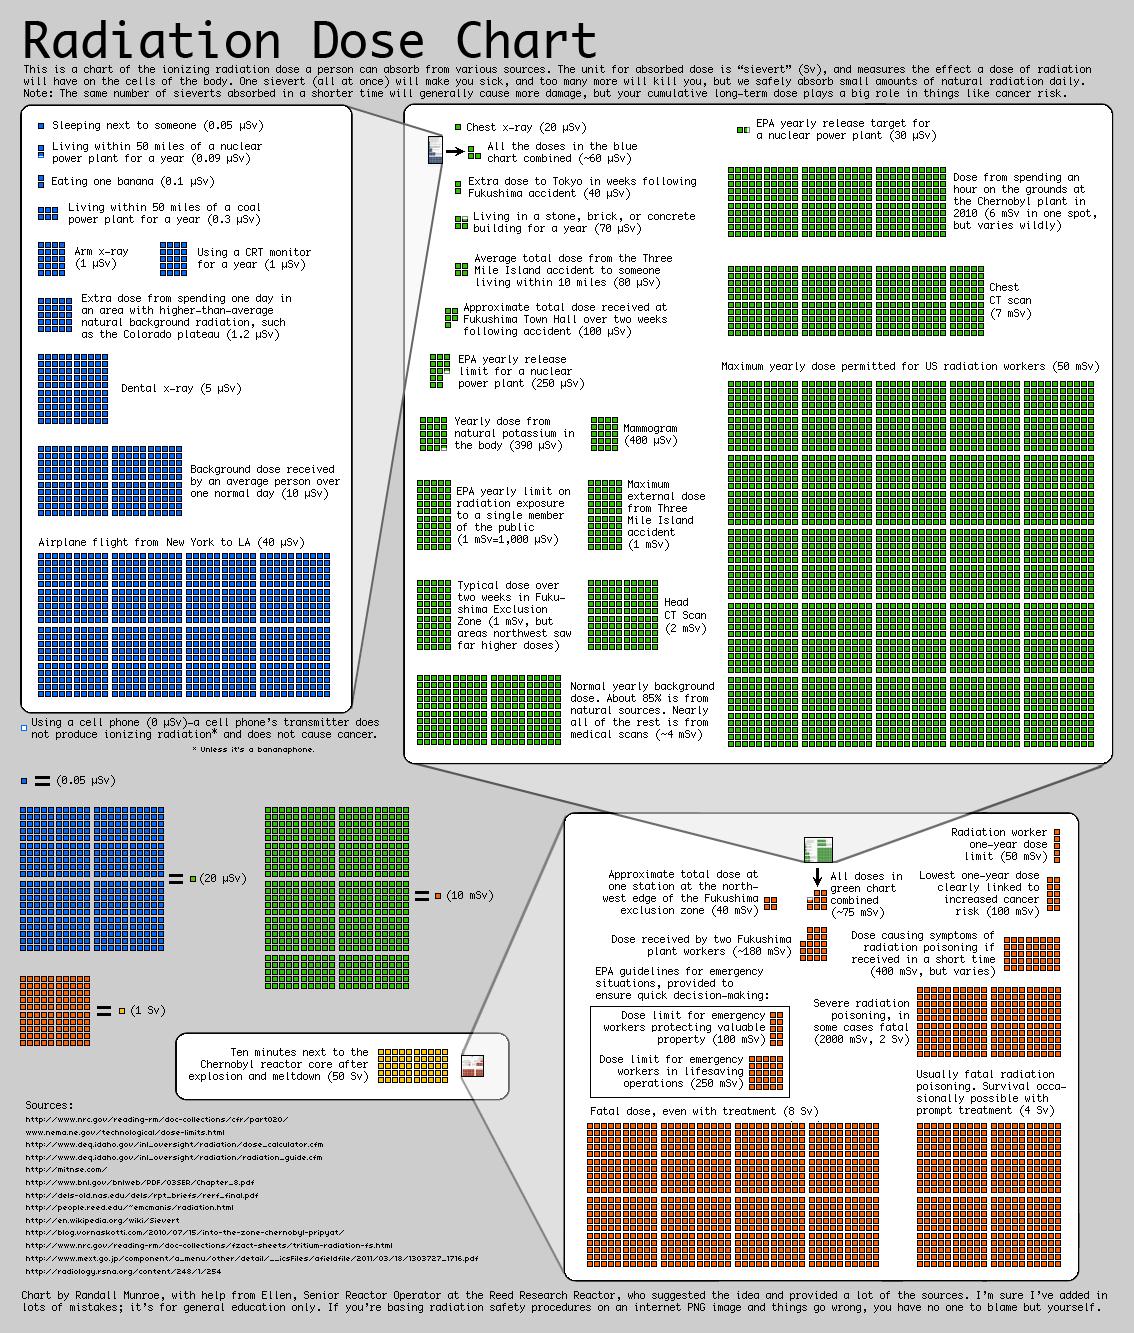 Notions de radioprotection et de radiodétection - Page 4 Radiation